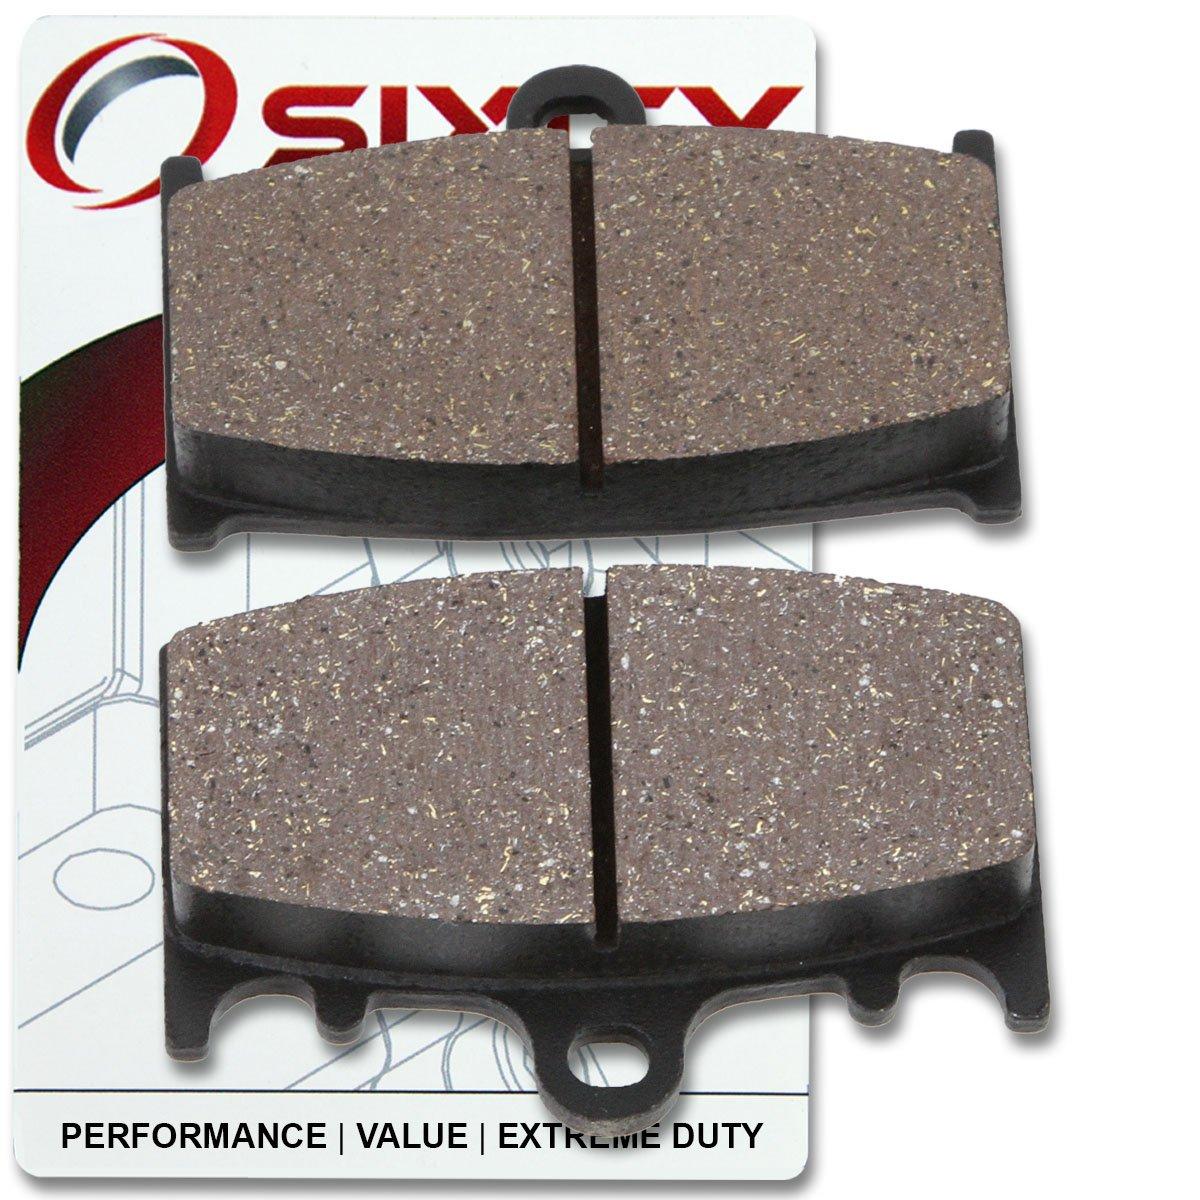 Sixity Rear Organic Brake Pads 2005-2009 for Suzuki C90 Boulevard Set Full Kit BK5 BK6 K5 K6 K8 K9 Complete